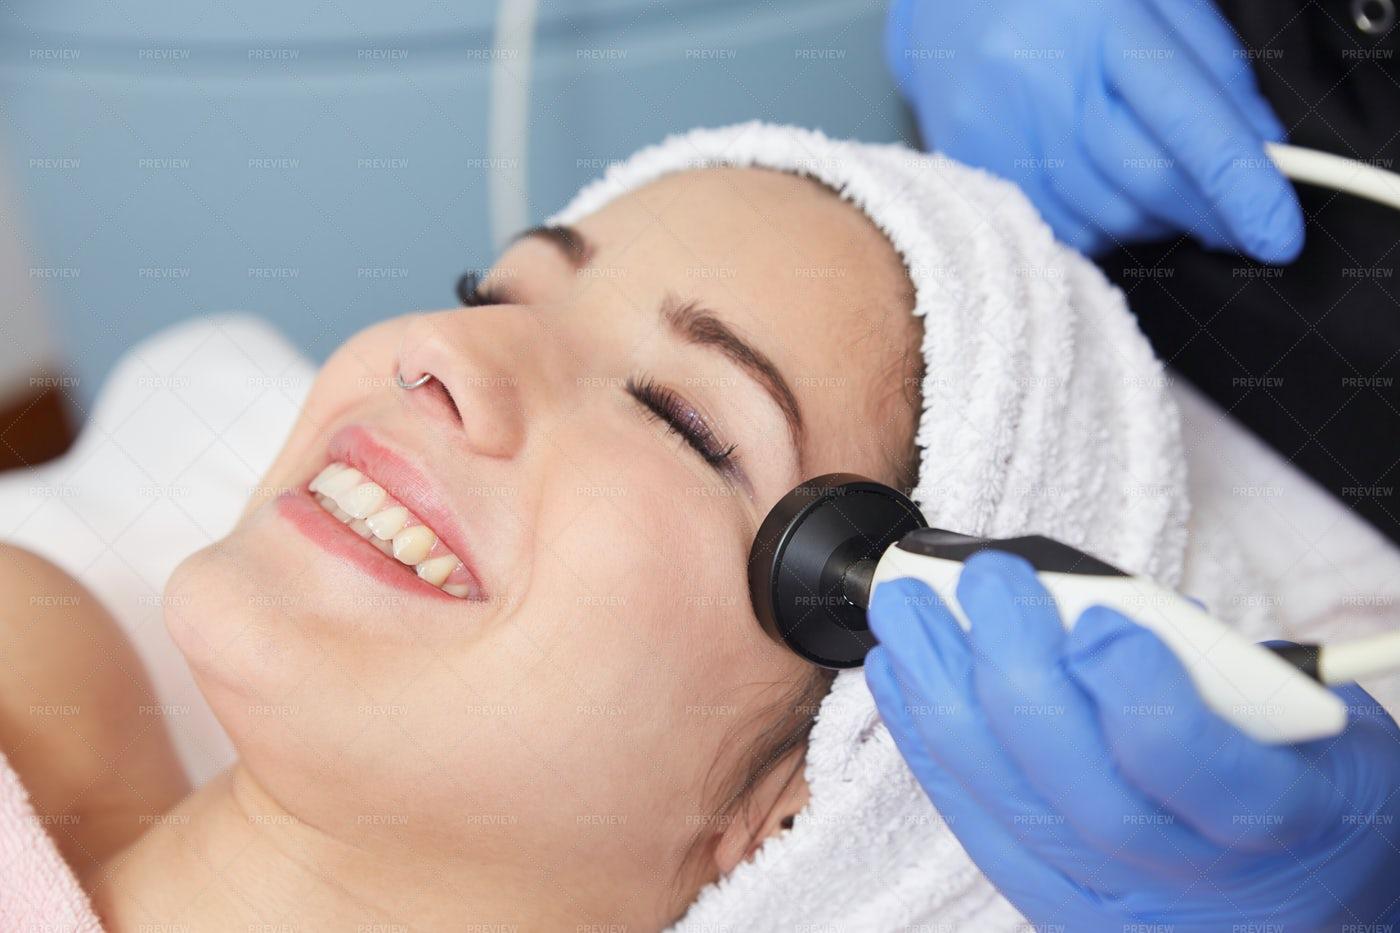 Radio Frequency Beauty Treatment: Stock Photos